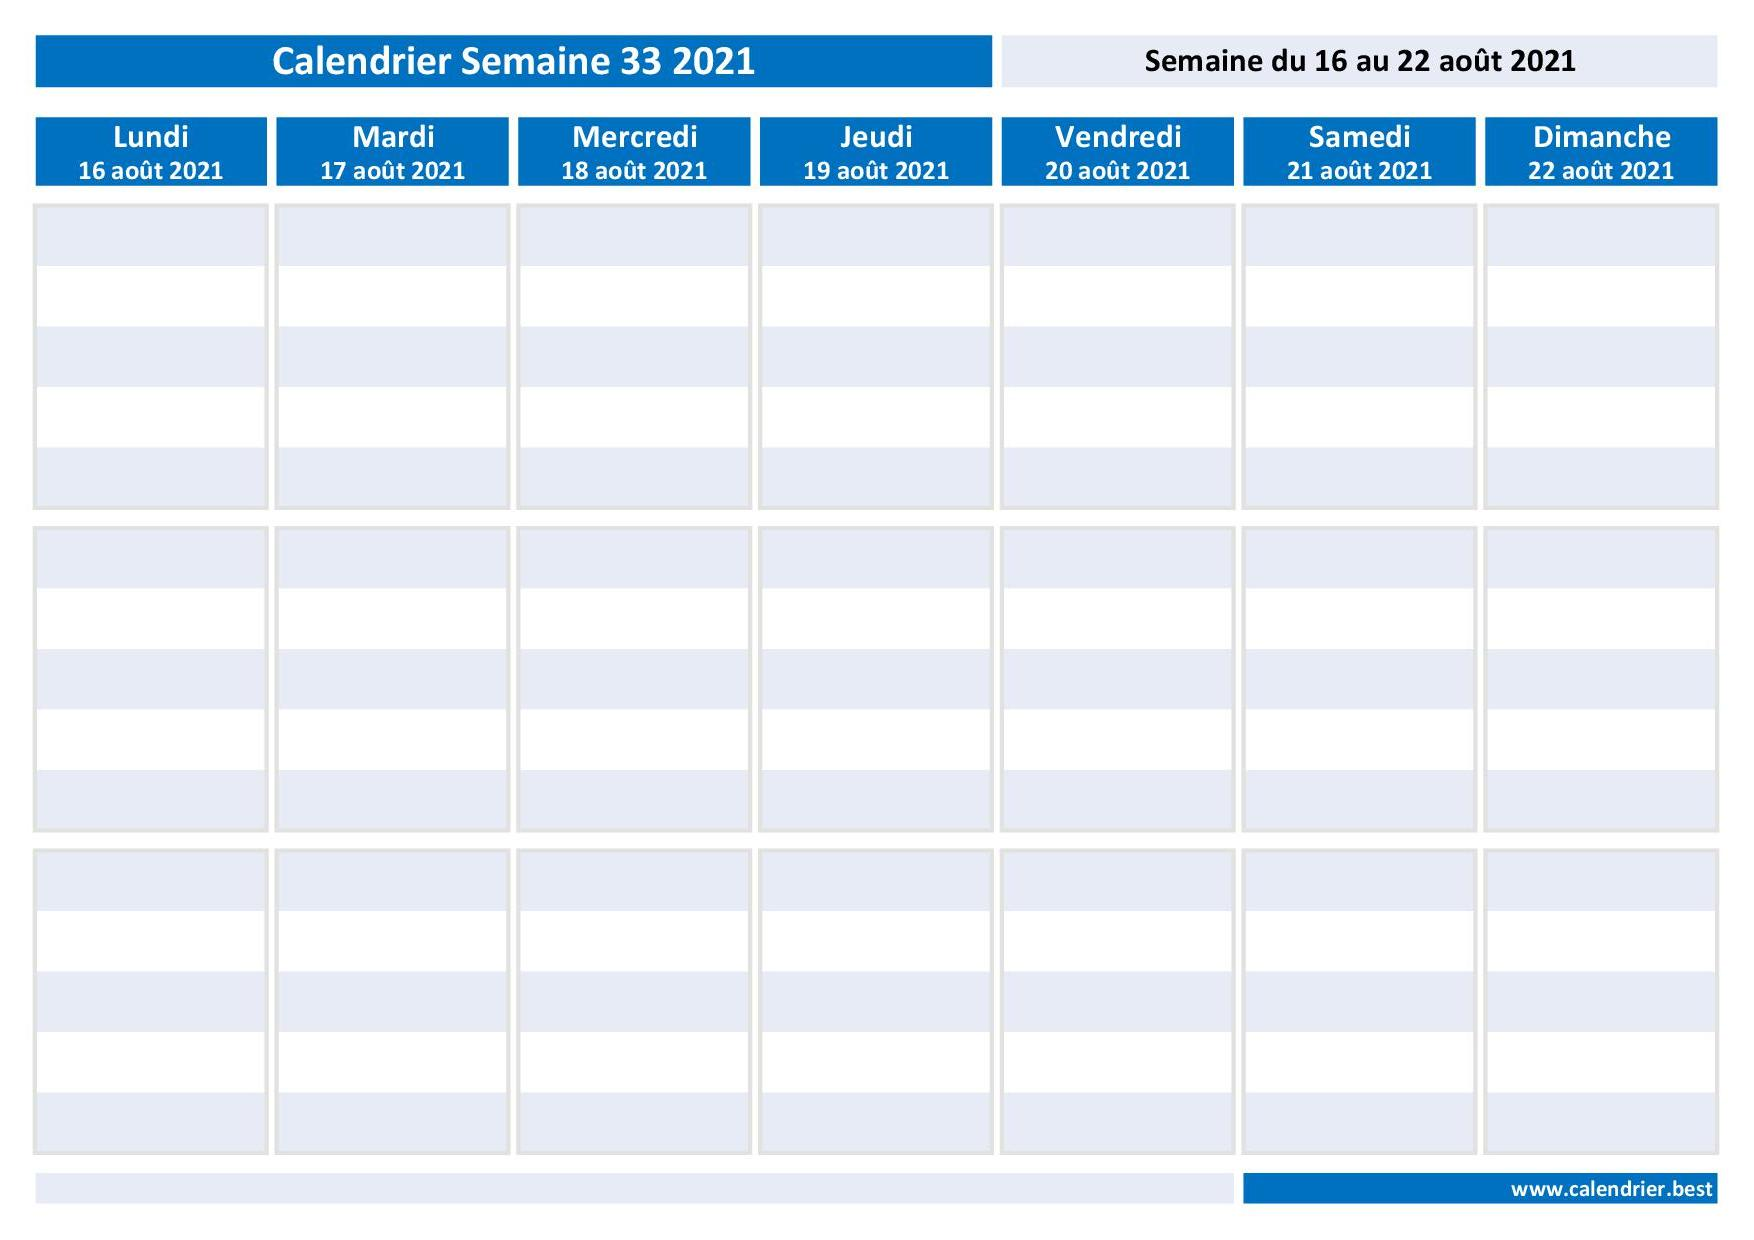 Semaine 33 2021 : dates, calendrier et planning  Calendrier.best